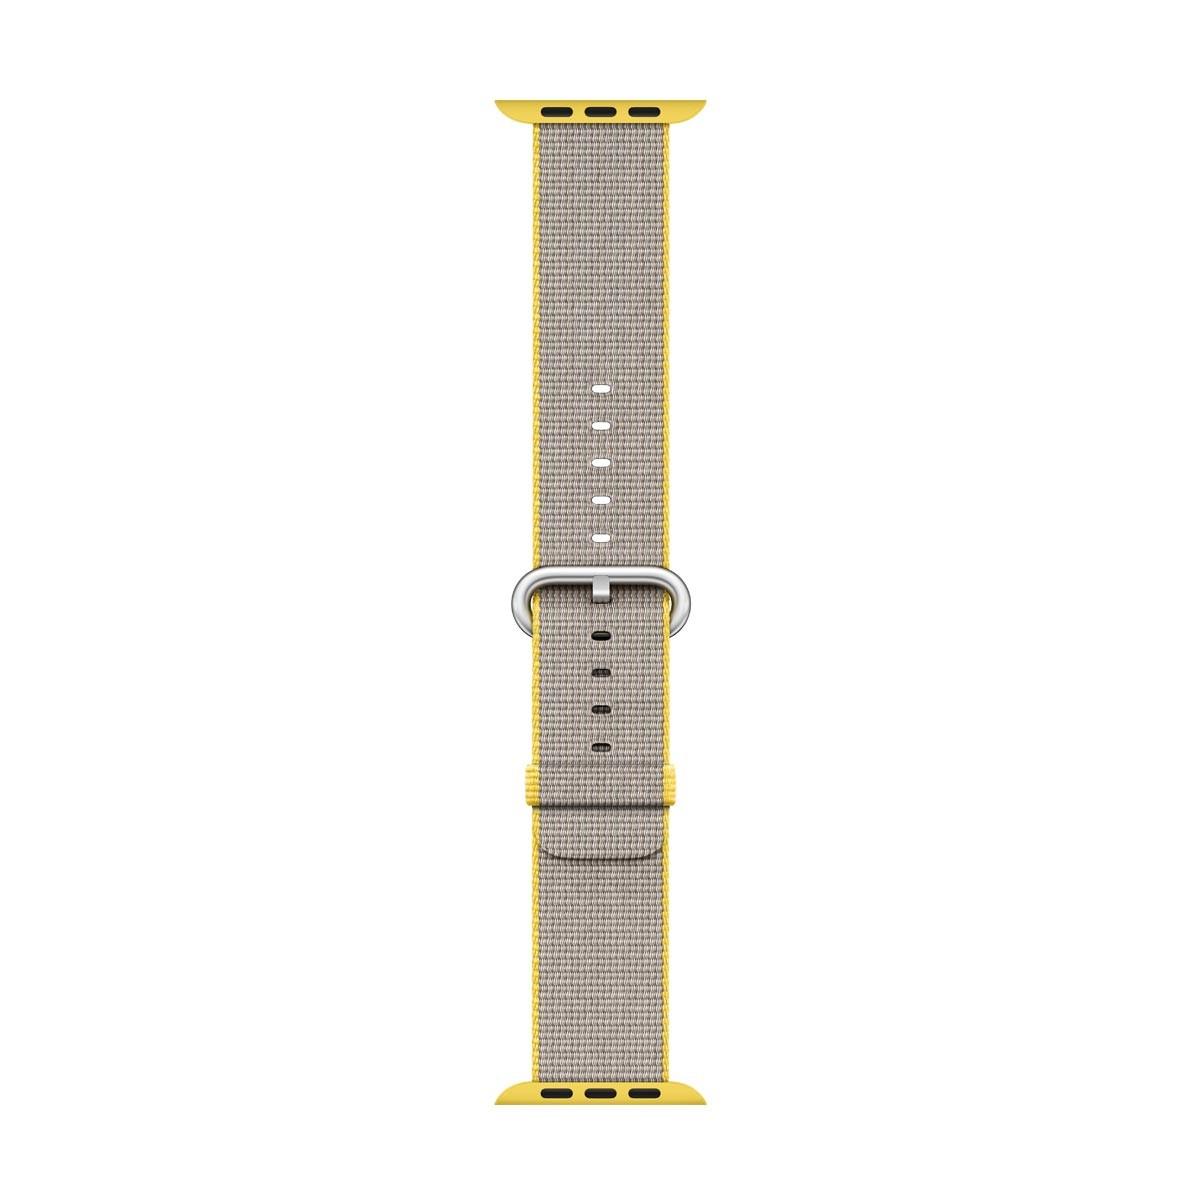 Apple - 38 mm Yellow/Light Grey Woven Nylon